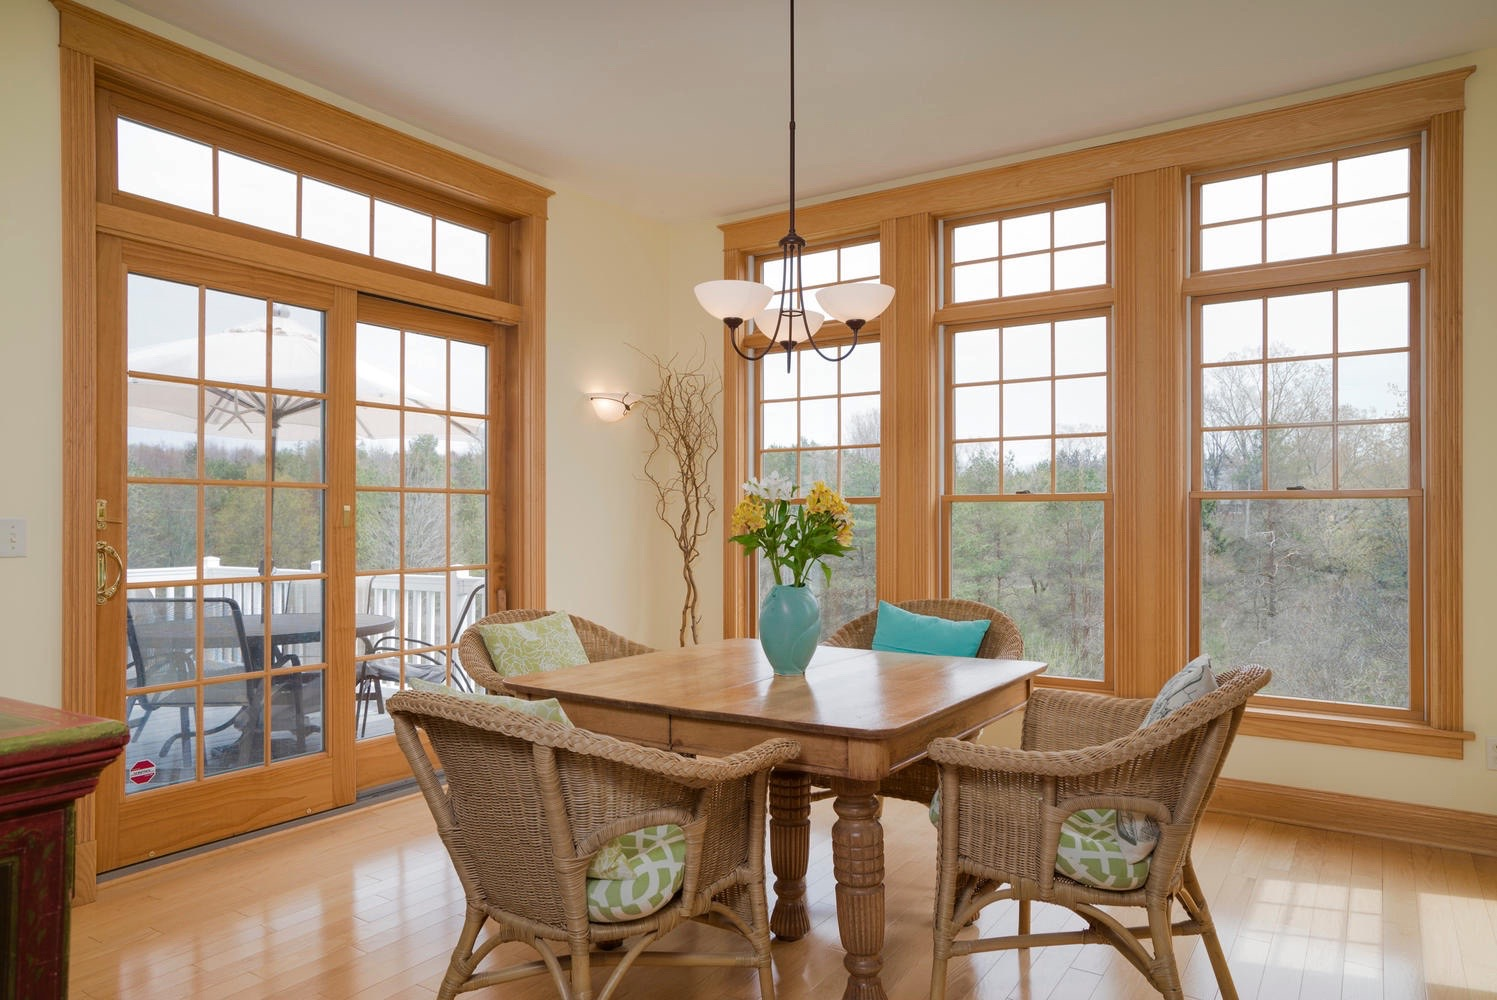 475 Porterville Rd East Aurora-large-007-20-Dining Room-1498x1000-72dpi